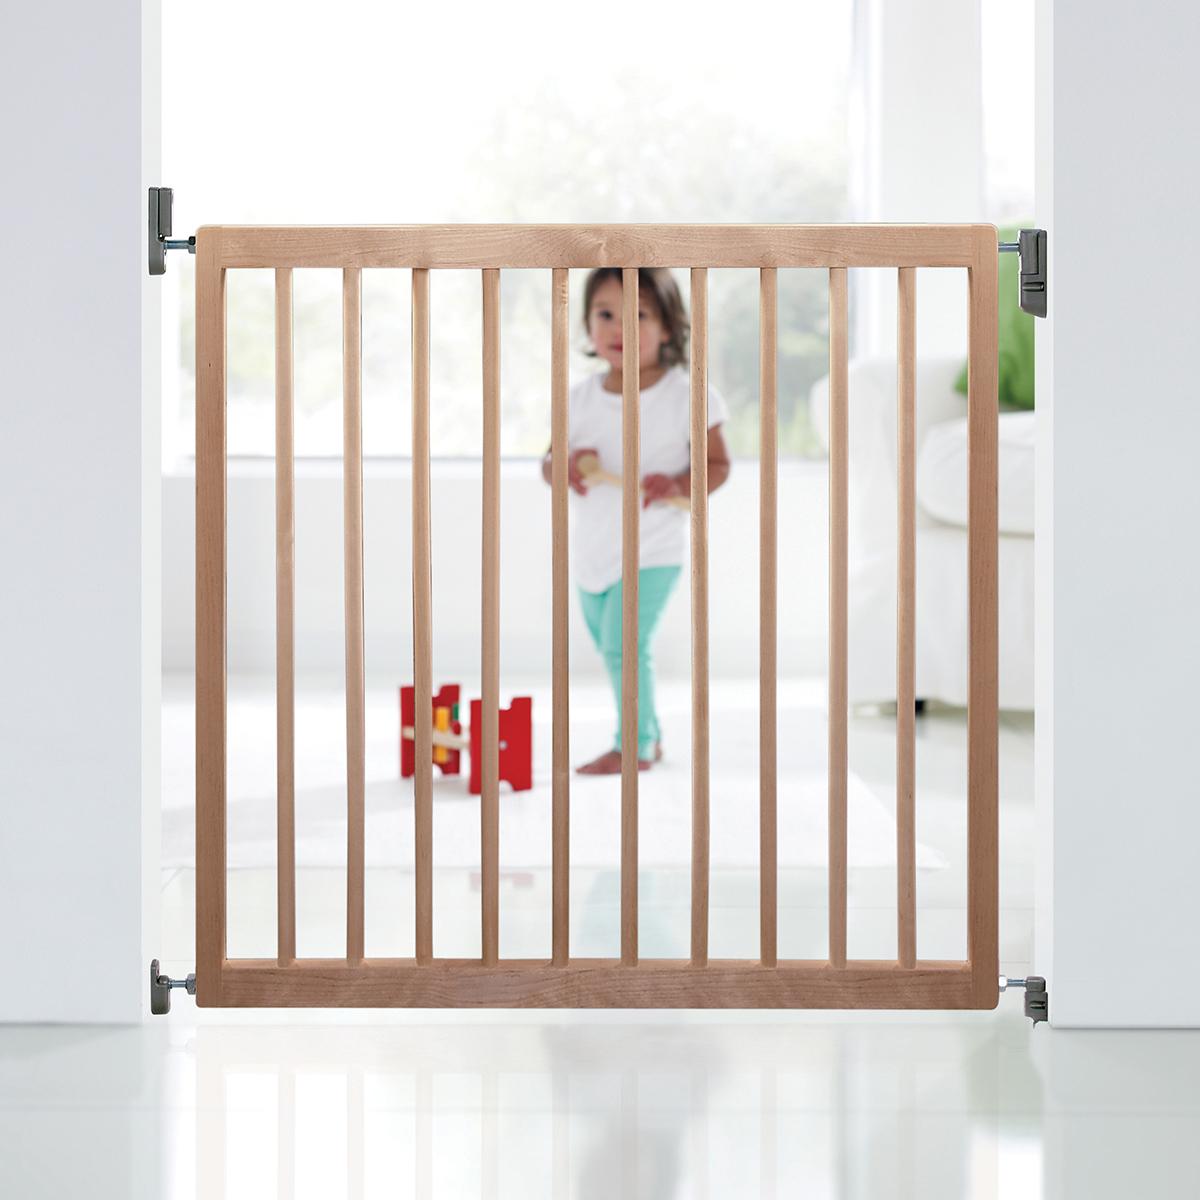 Single Wood Panel ~ Munchkin single panel wood wall mounted safety barrier